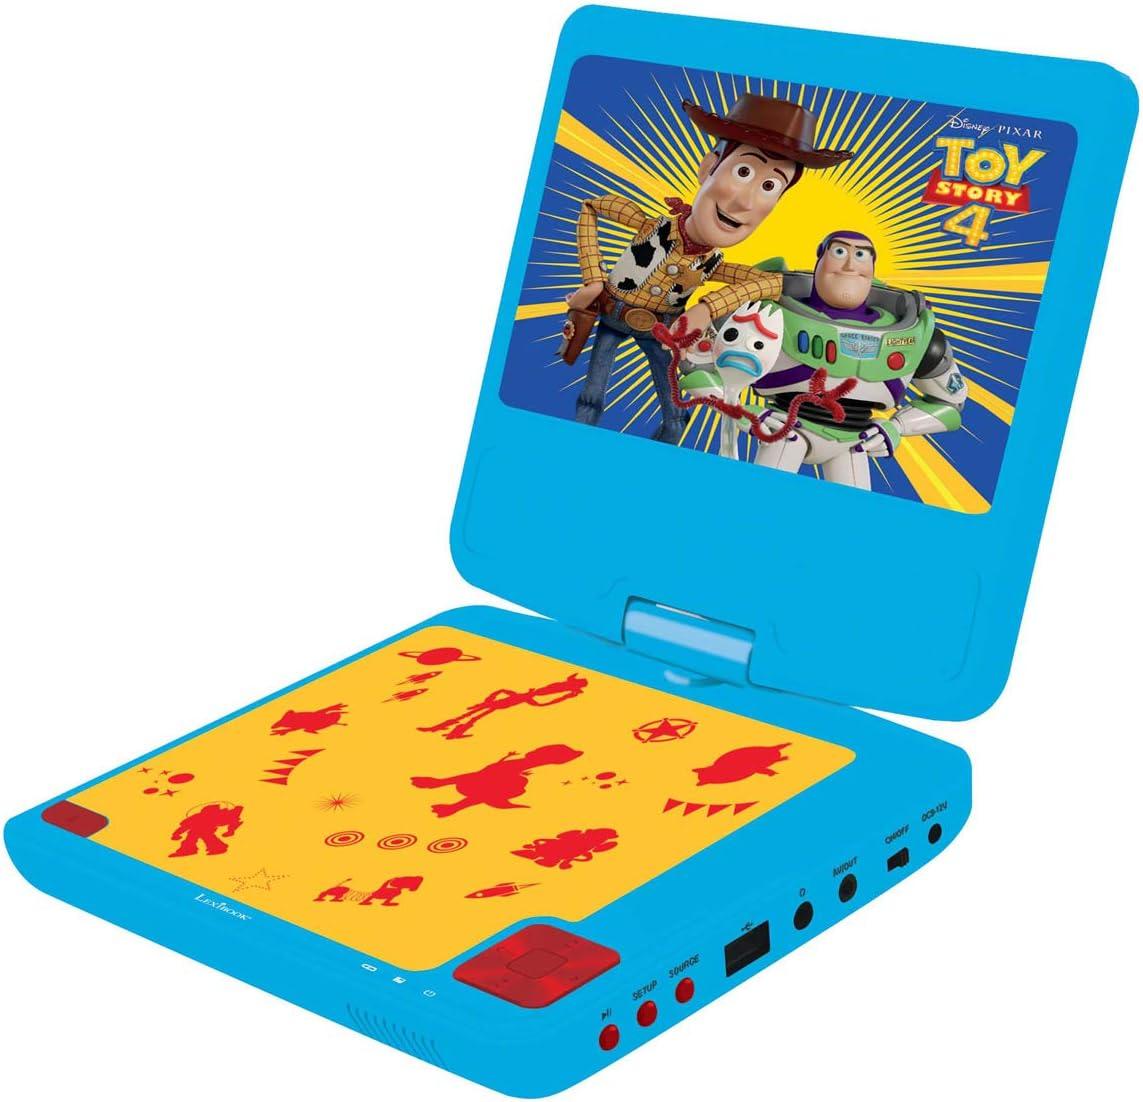 Amazon.es: LEXIBOOK Tos Disney Toys Story 4-Lector DVD portátil, Pantalla LCD giratoria 7